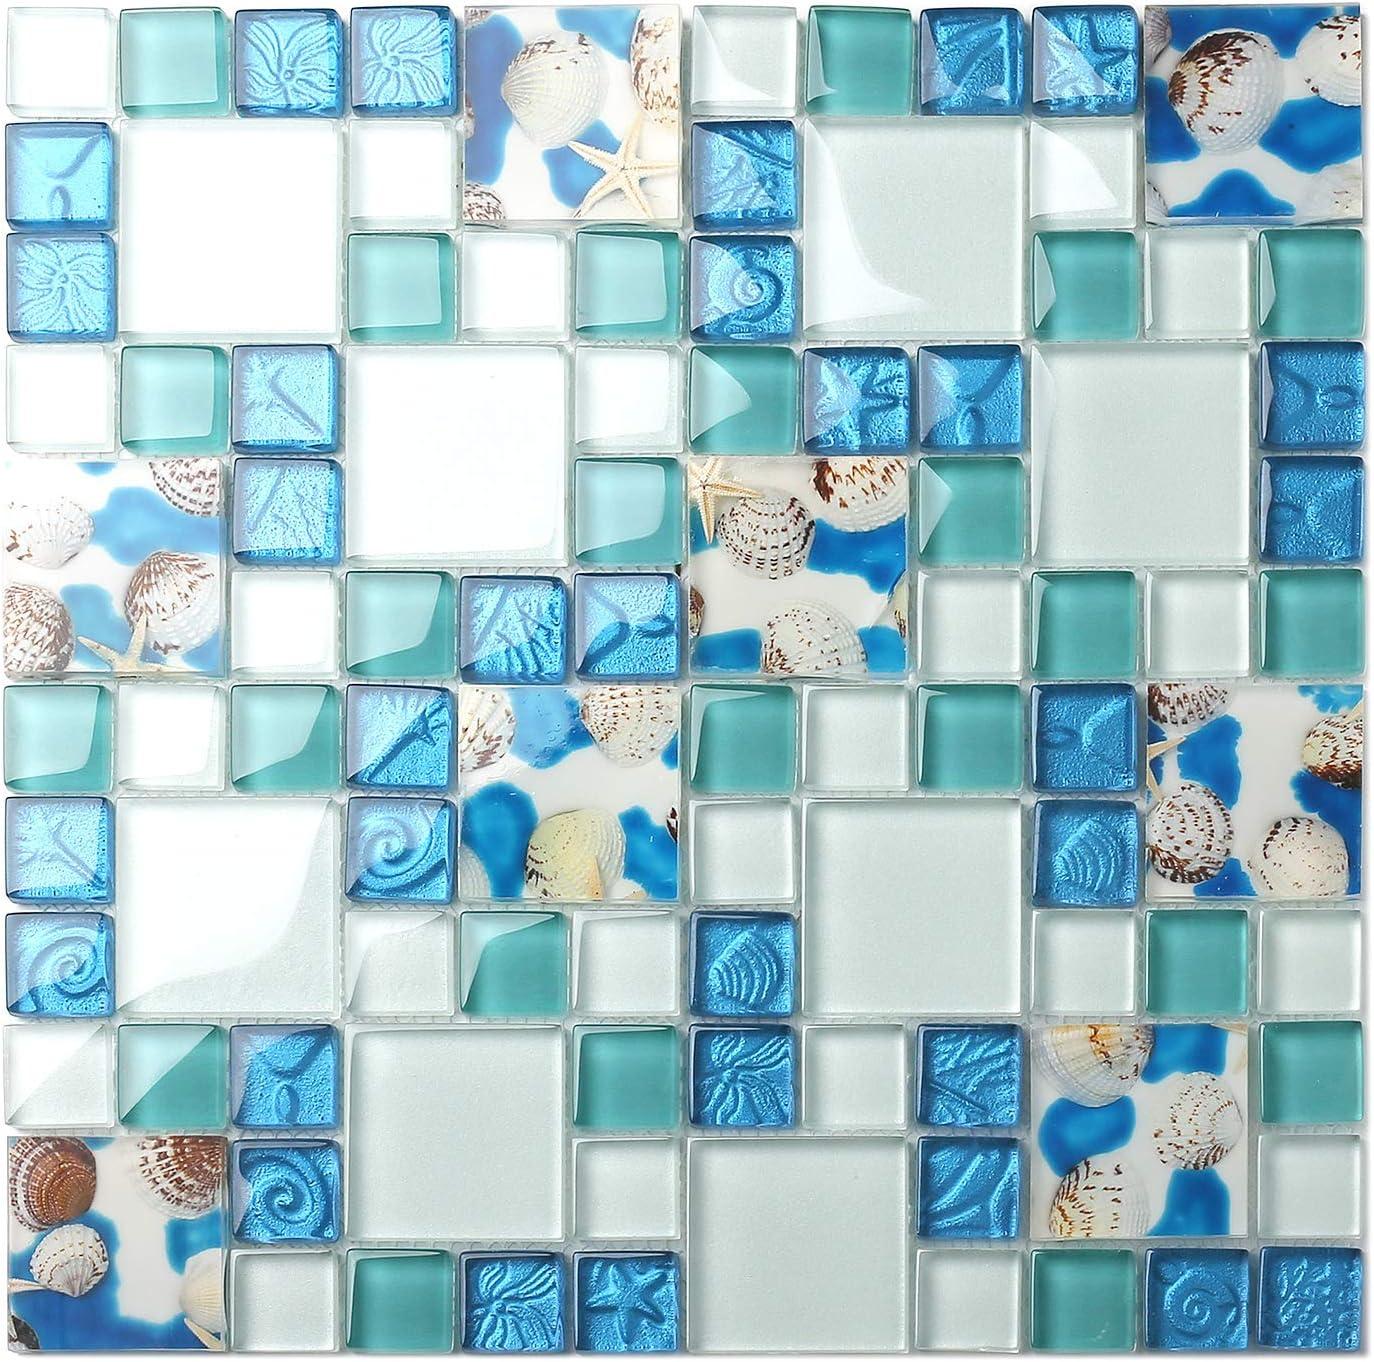 Tst Mosaic Tiles Glass Conch Tiles Beach Style Sea Blue Glass Tile Glass Mosaics Wall Art Kitchen Backsplash Bathroom Design Tstgt370 1 Sample 12x12 Inches Amazon Com